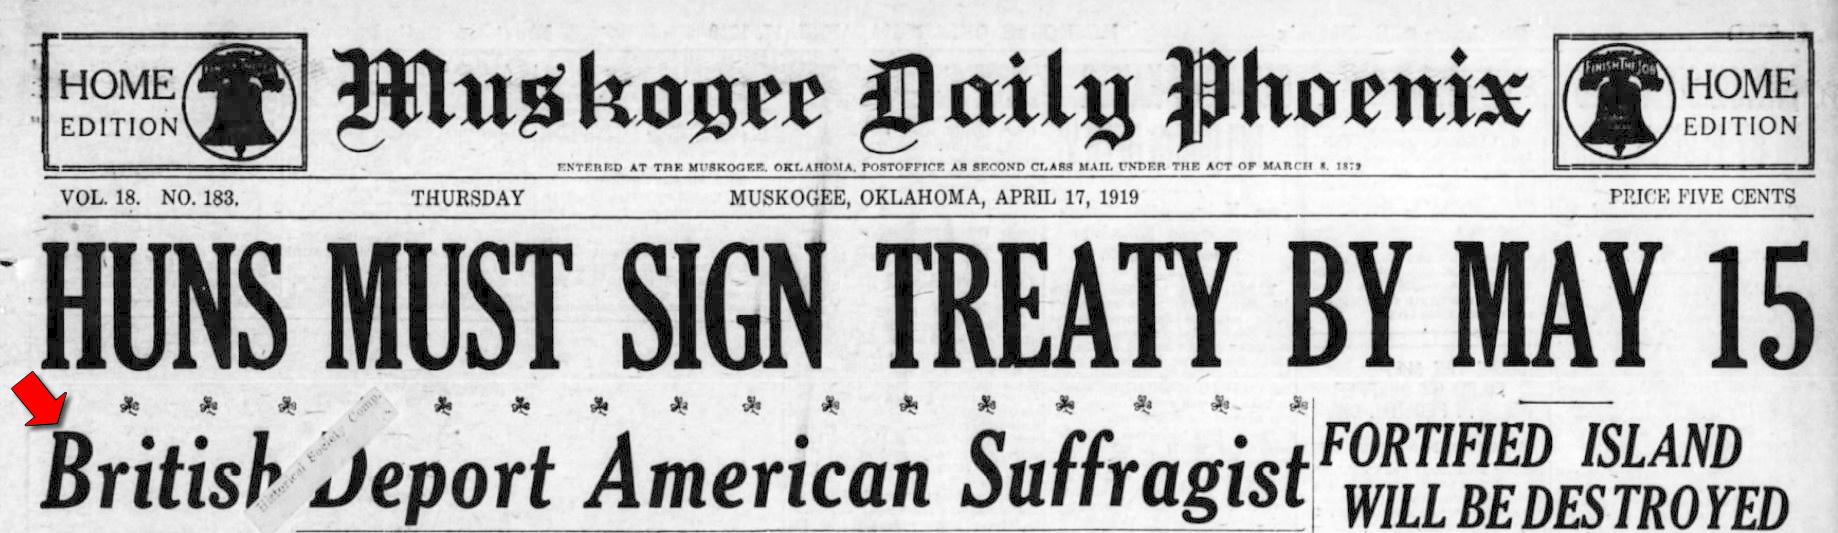 Editor. (Apr. 17, 1919). British Deport American Suffragist [Lillian Scott Troy]. Muskogee Daily Phoenix.